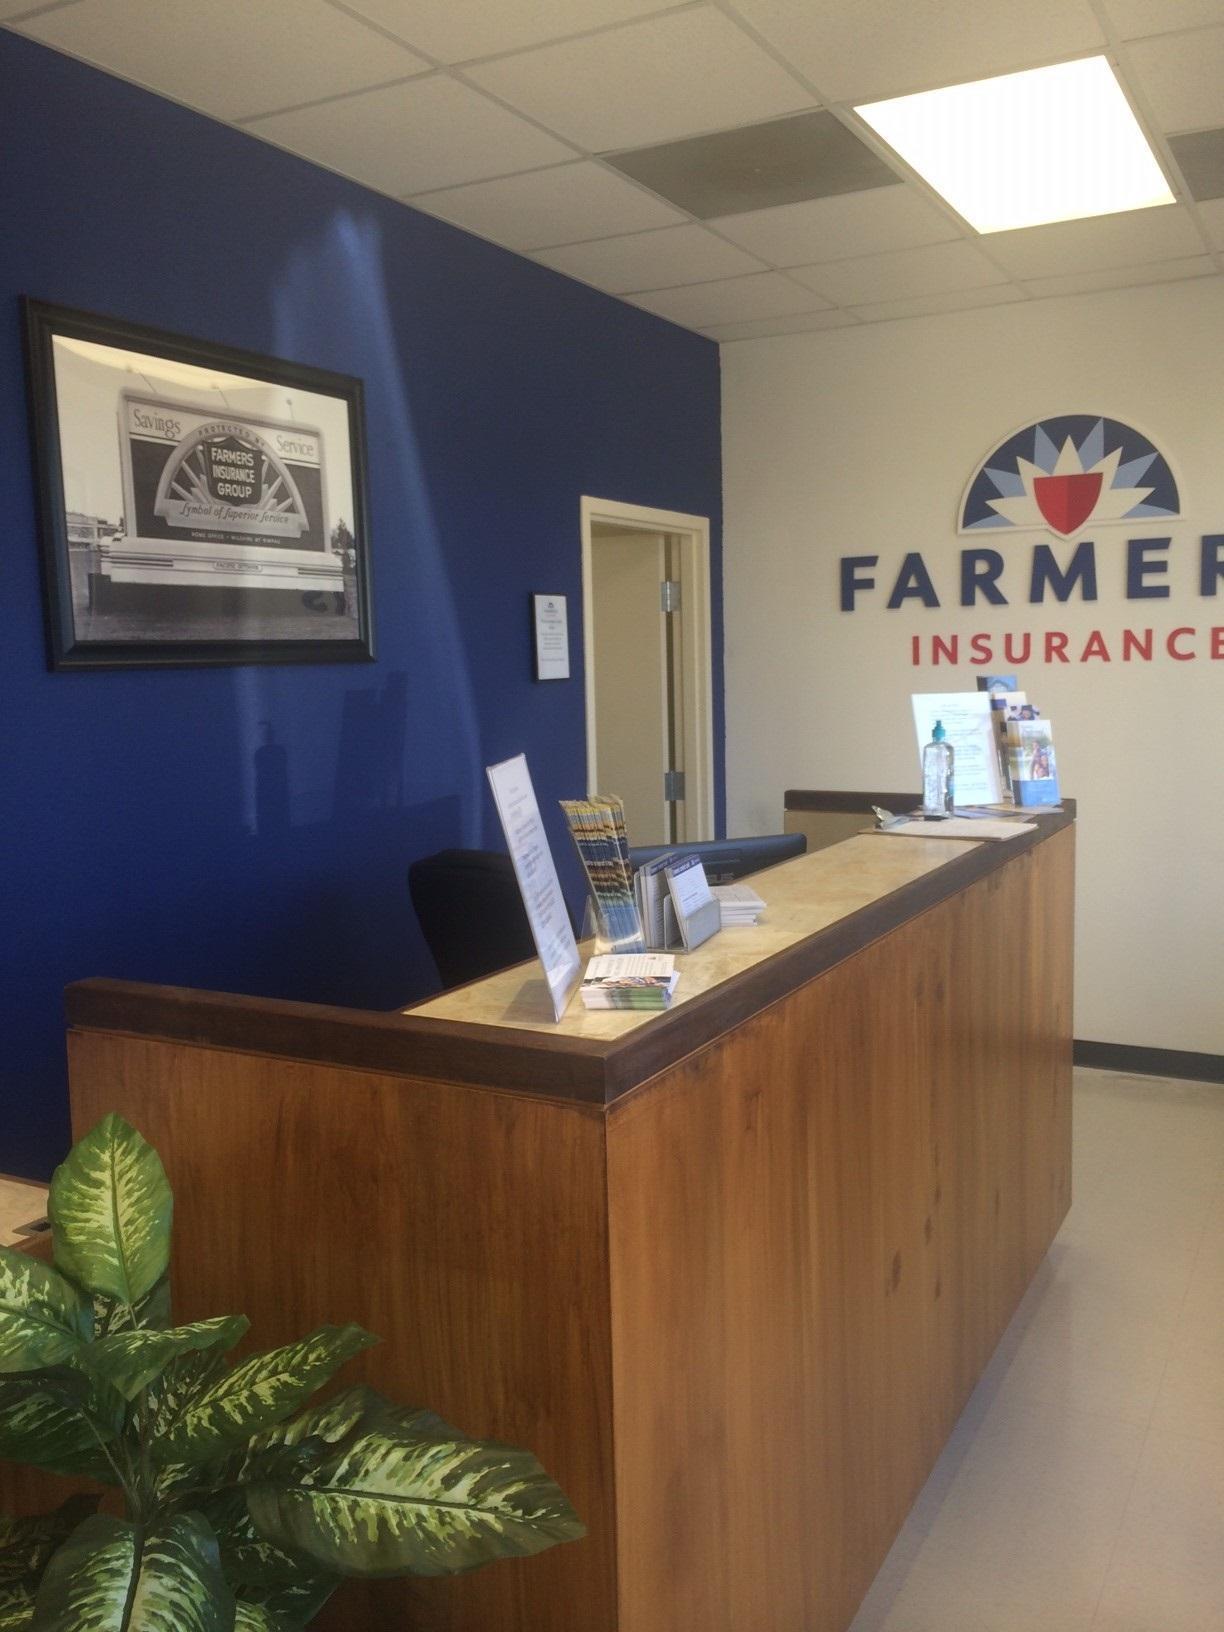 Farmers Insurance - Blake Jones image 9